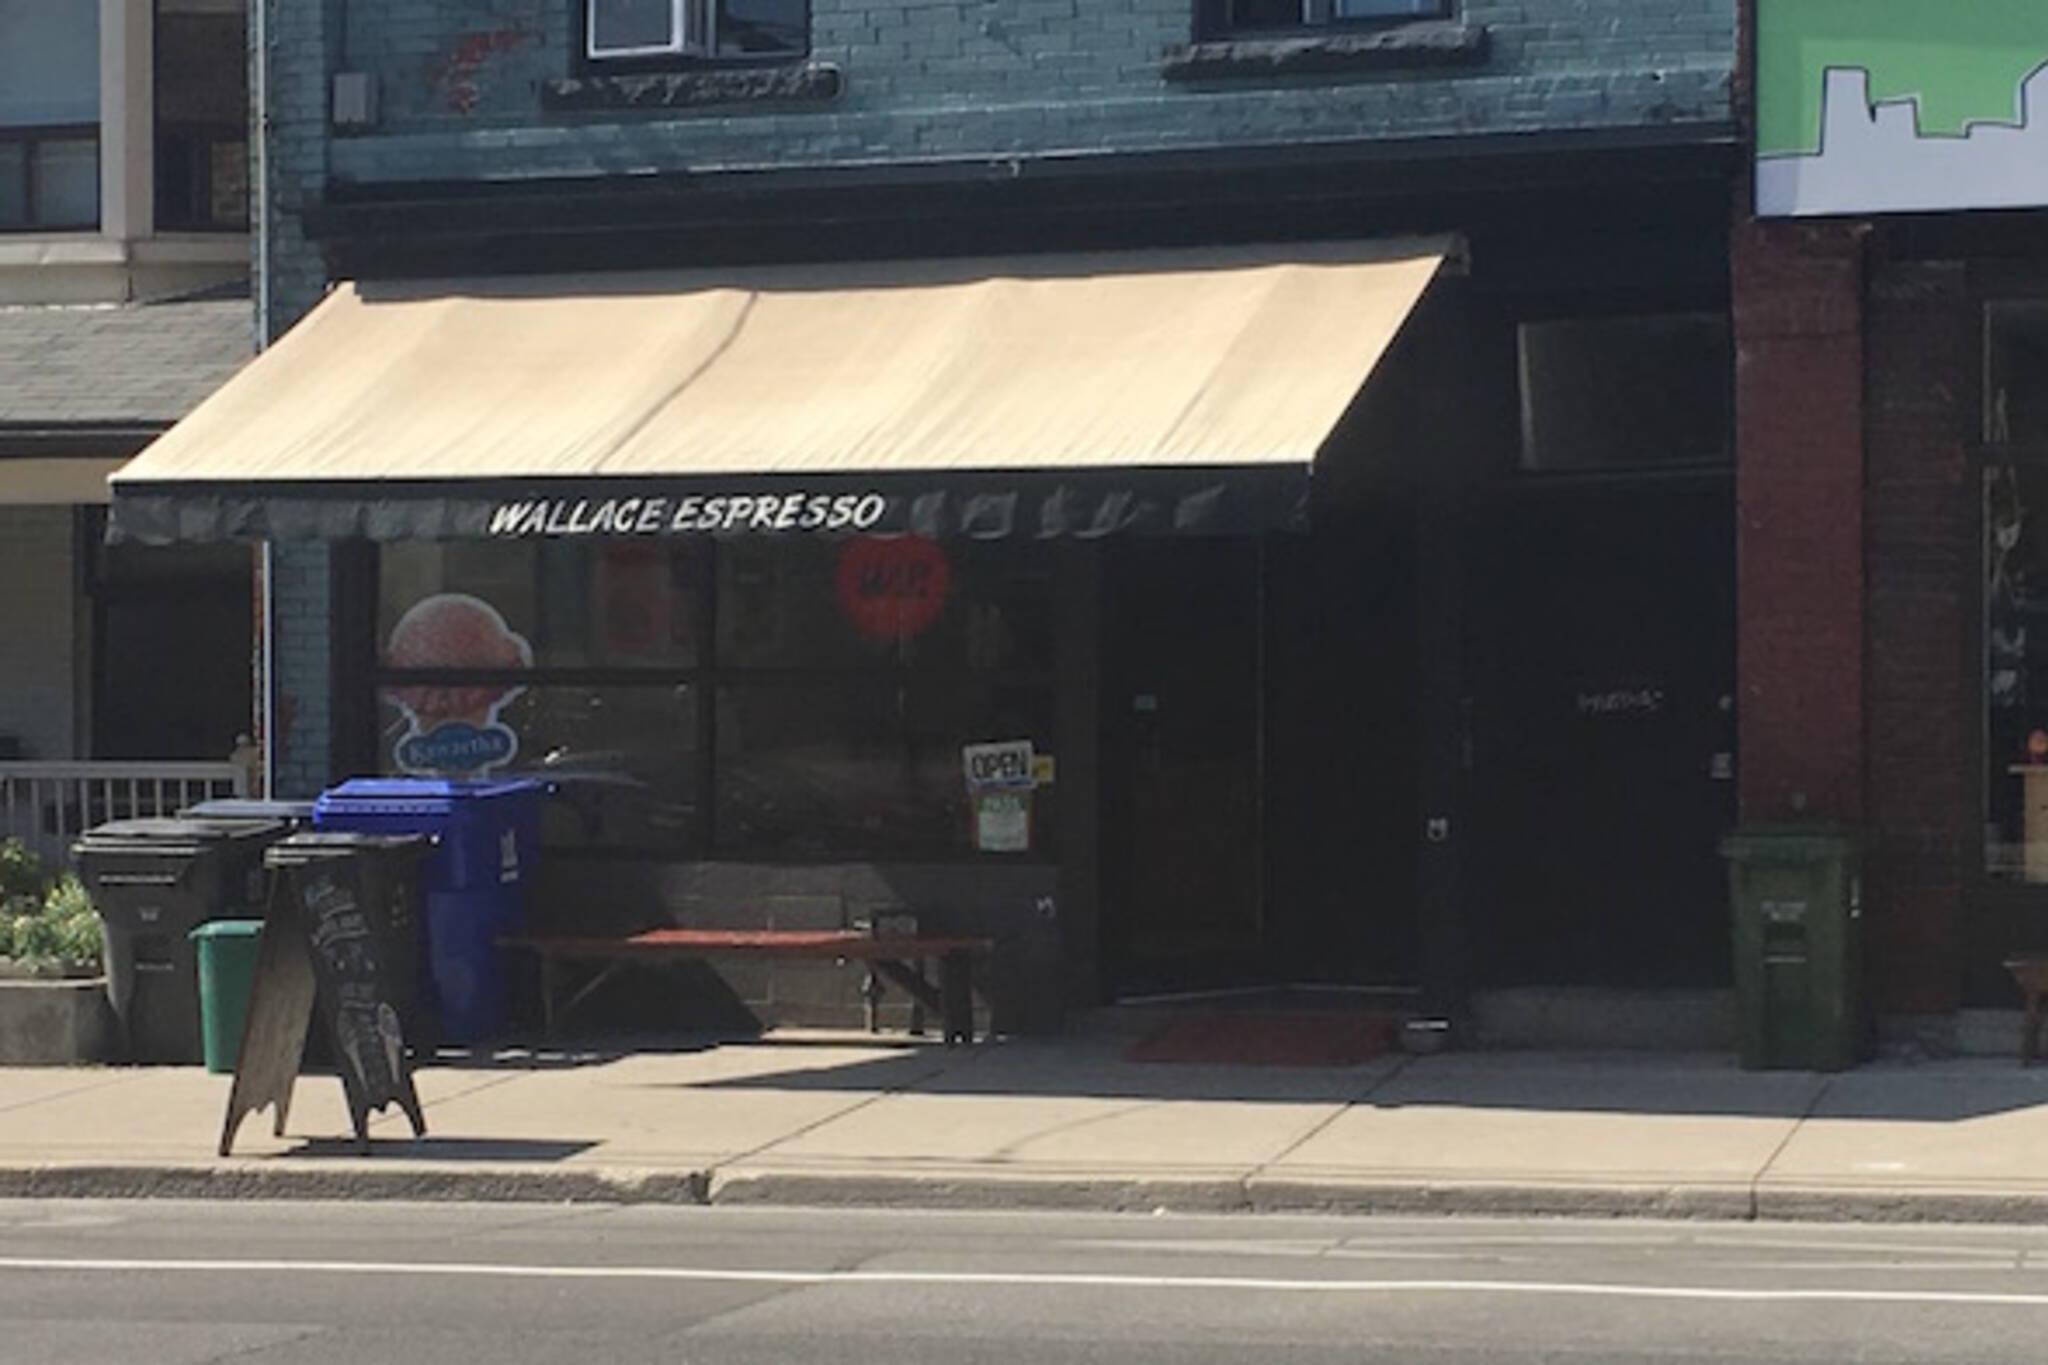 Wallace Espresso Dupont Toronto